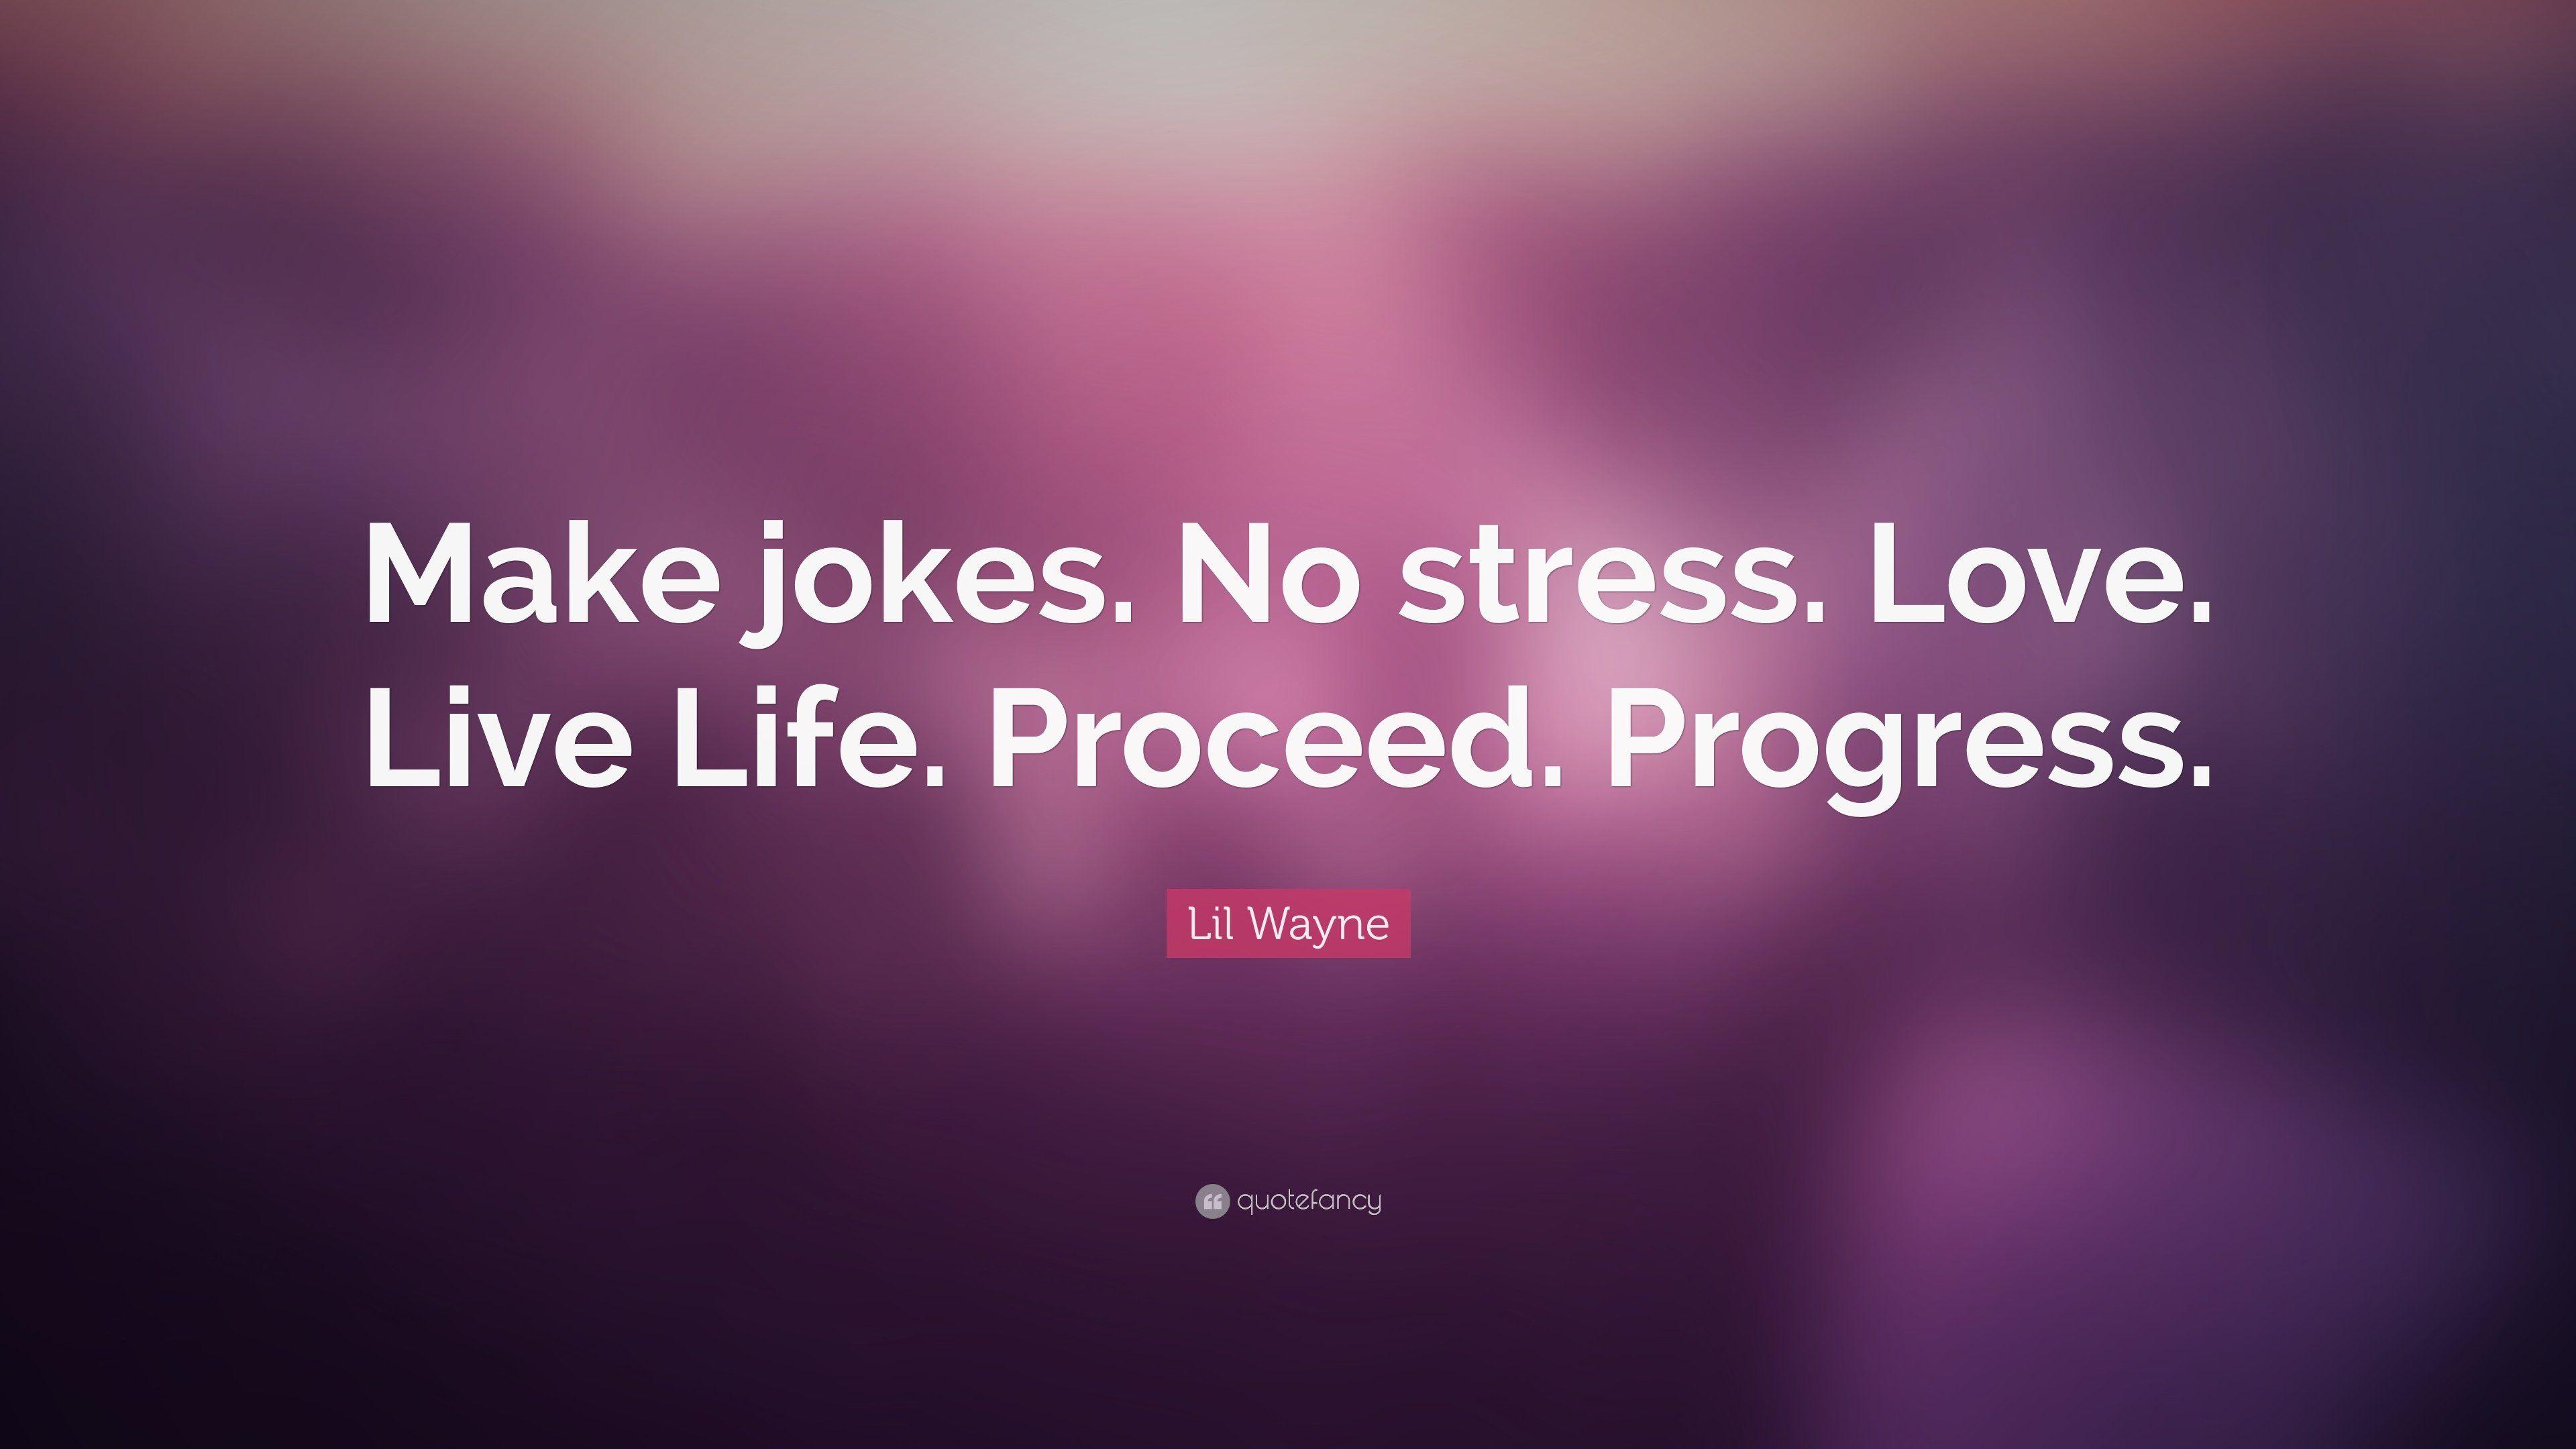 Snowdrop reccomend Make jokes no stress love live life proceed progress quote